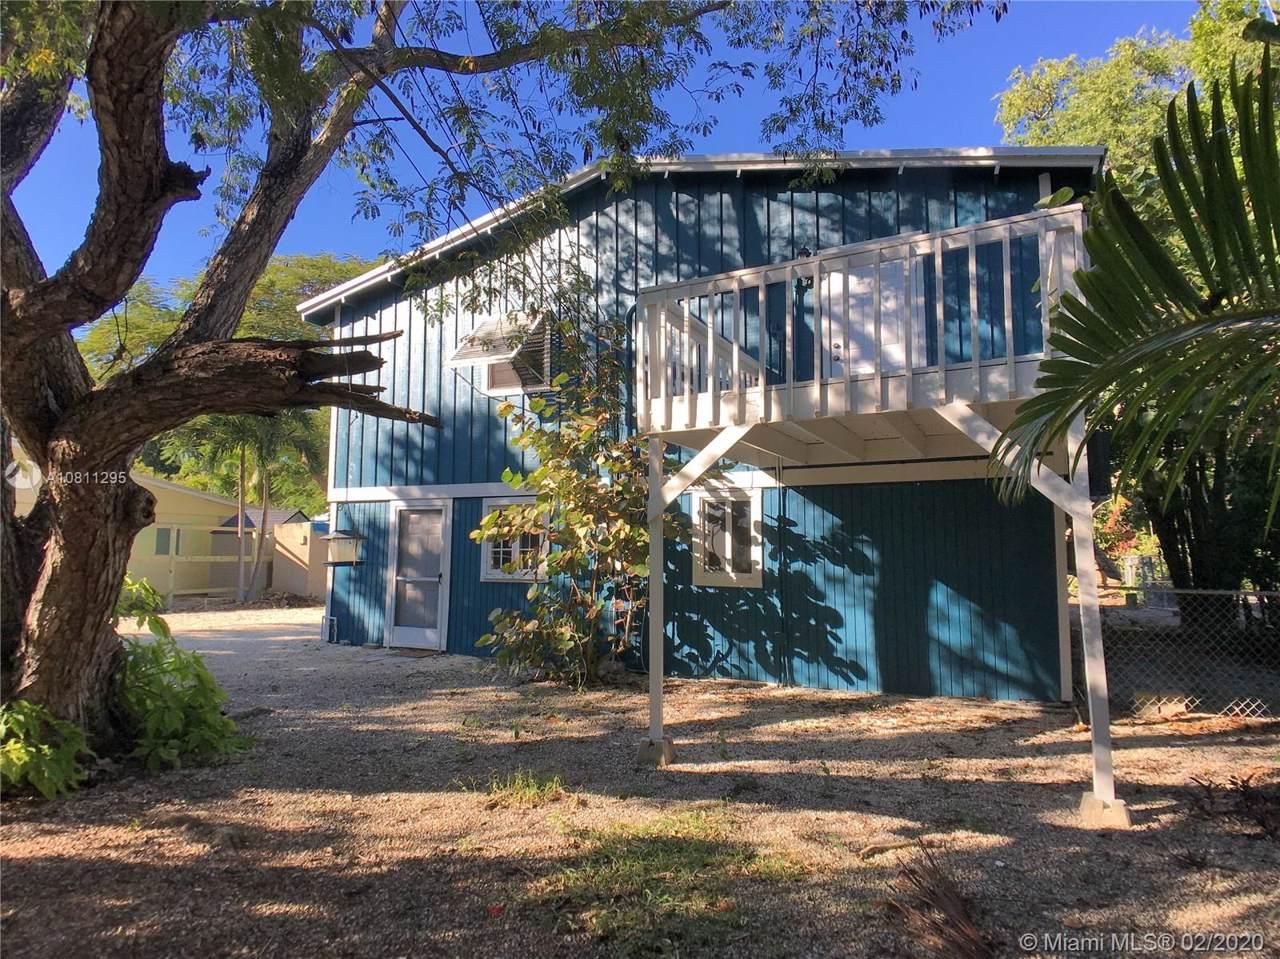 120 South Bay Harbor Drive - Photo 1